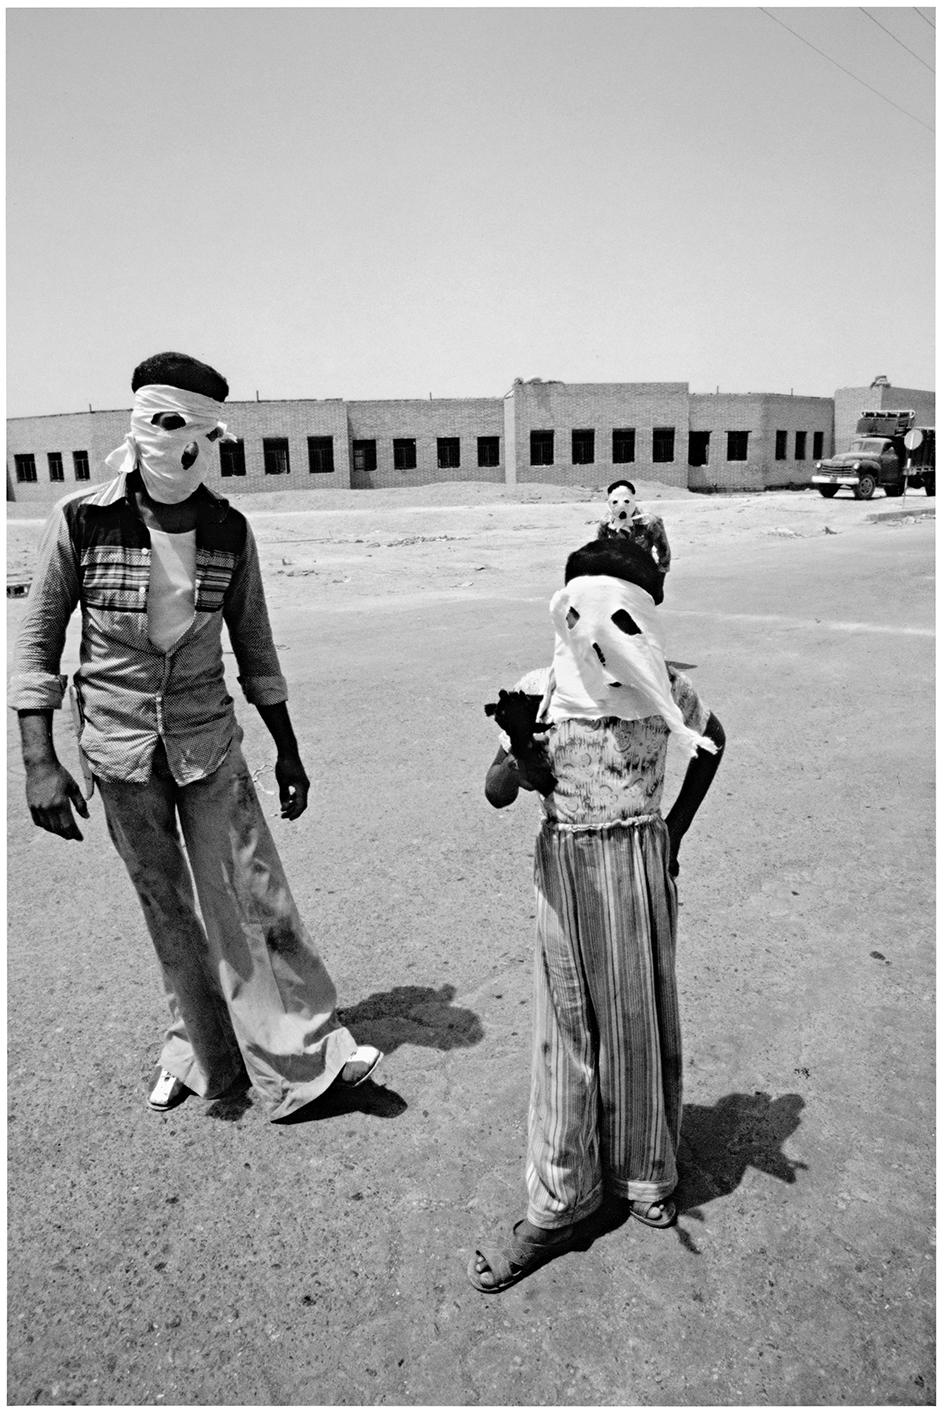 &#169Christine Spengler - Iran, 1989.